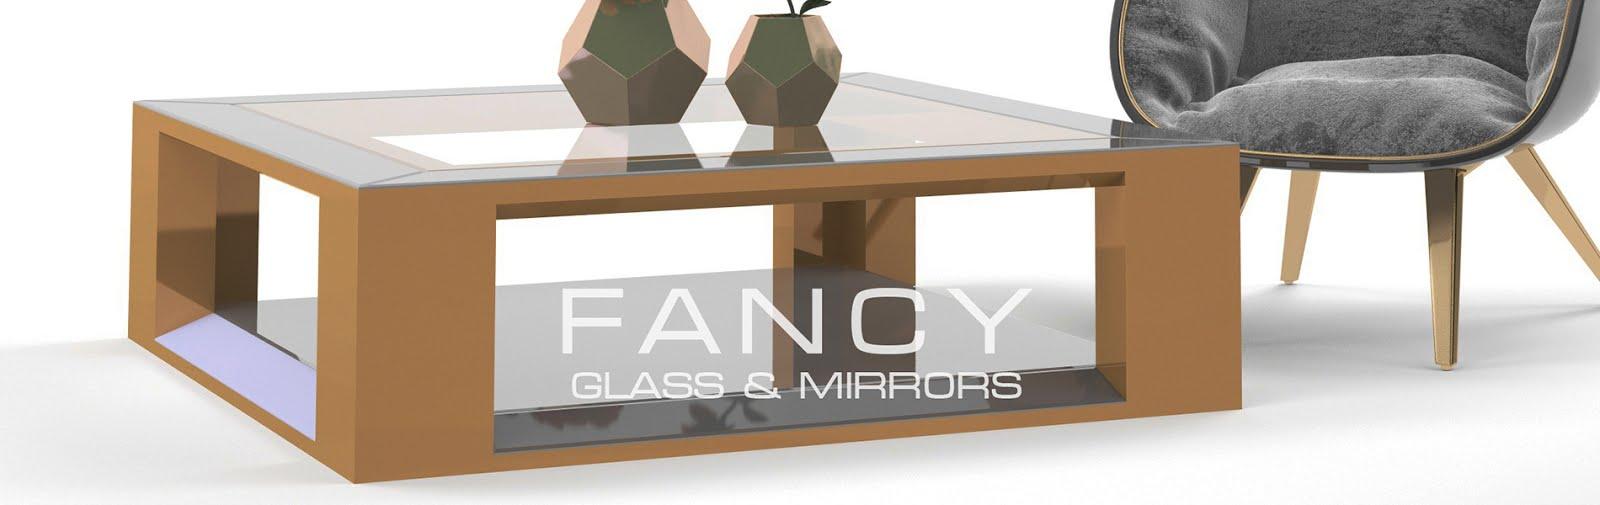 Mirrored square coffe table